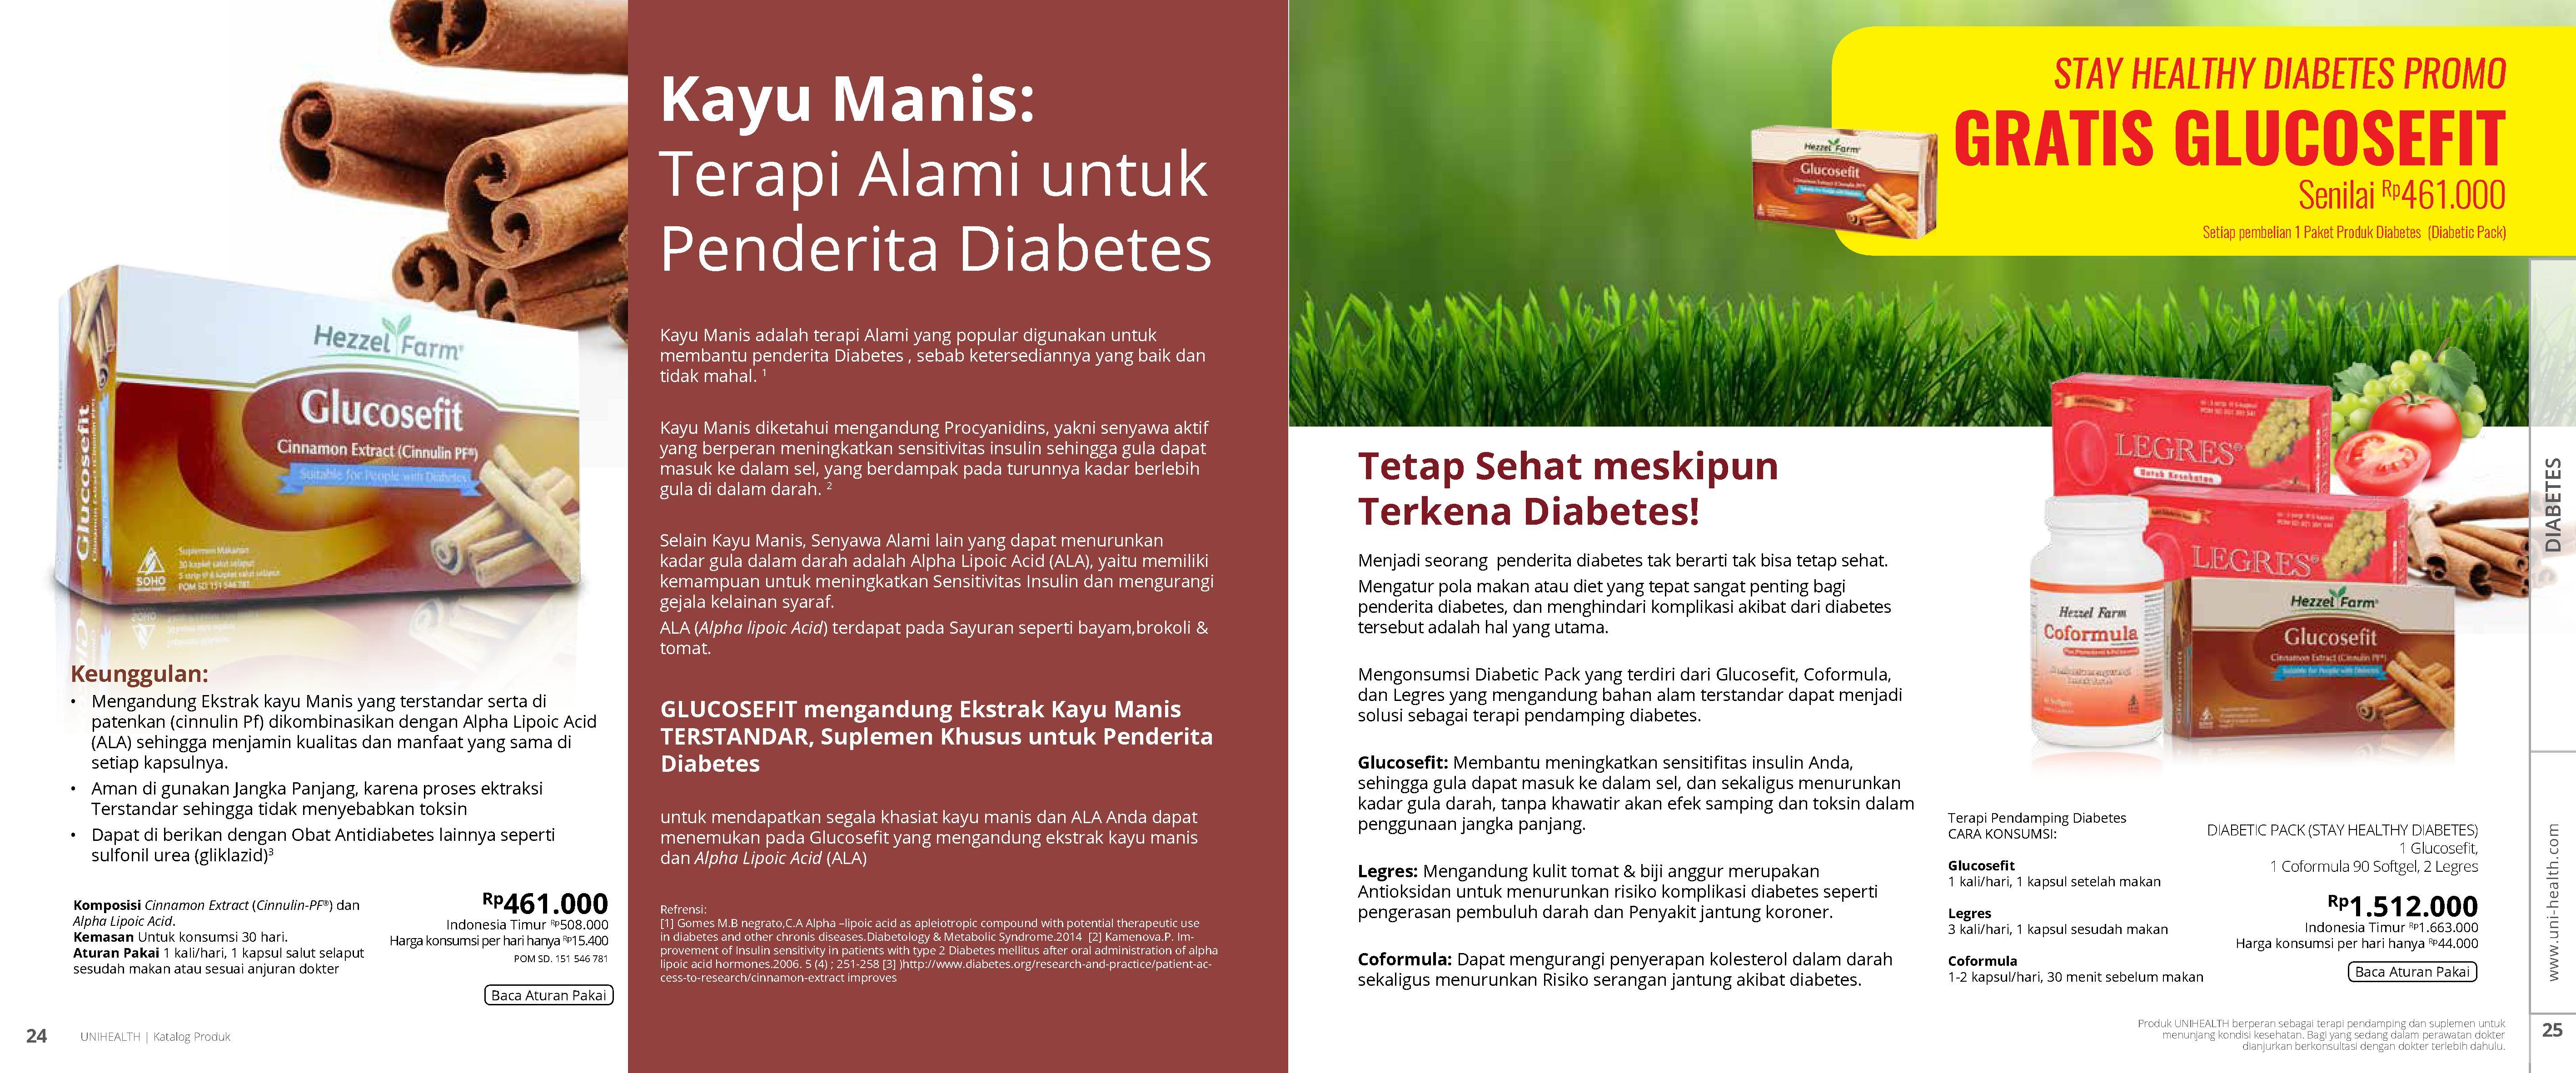 Diabetics Often do not aware of the Disease